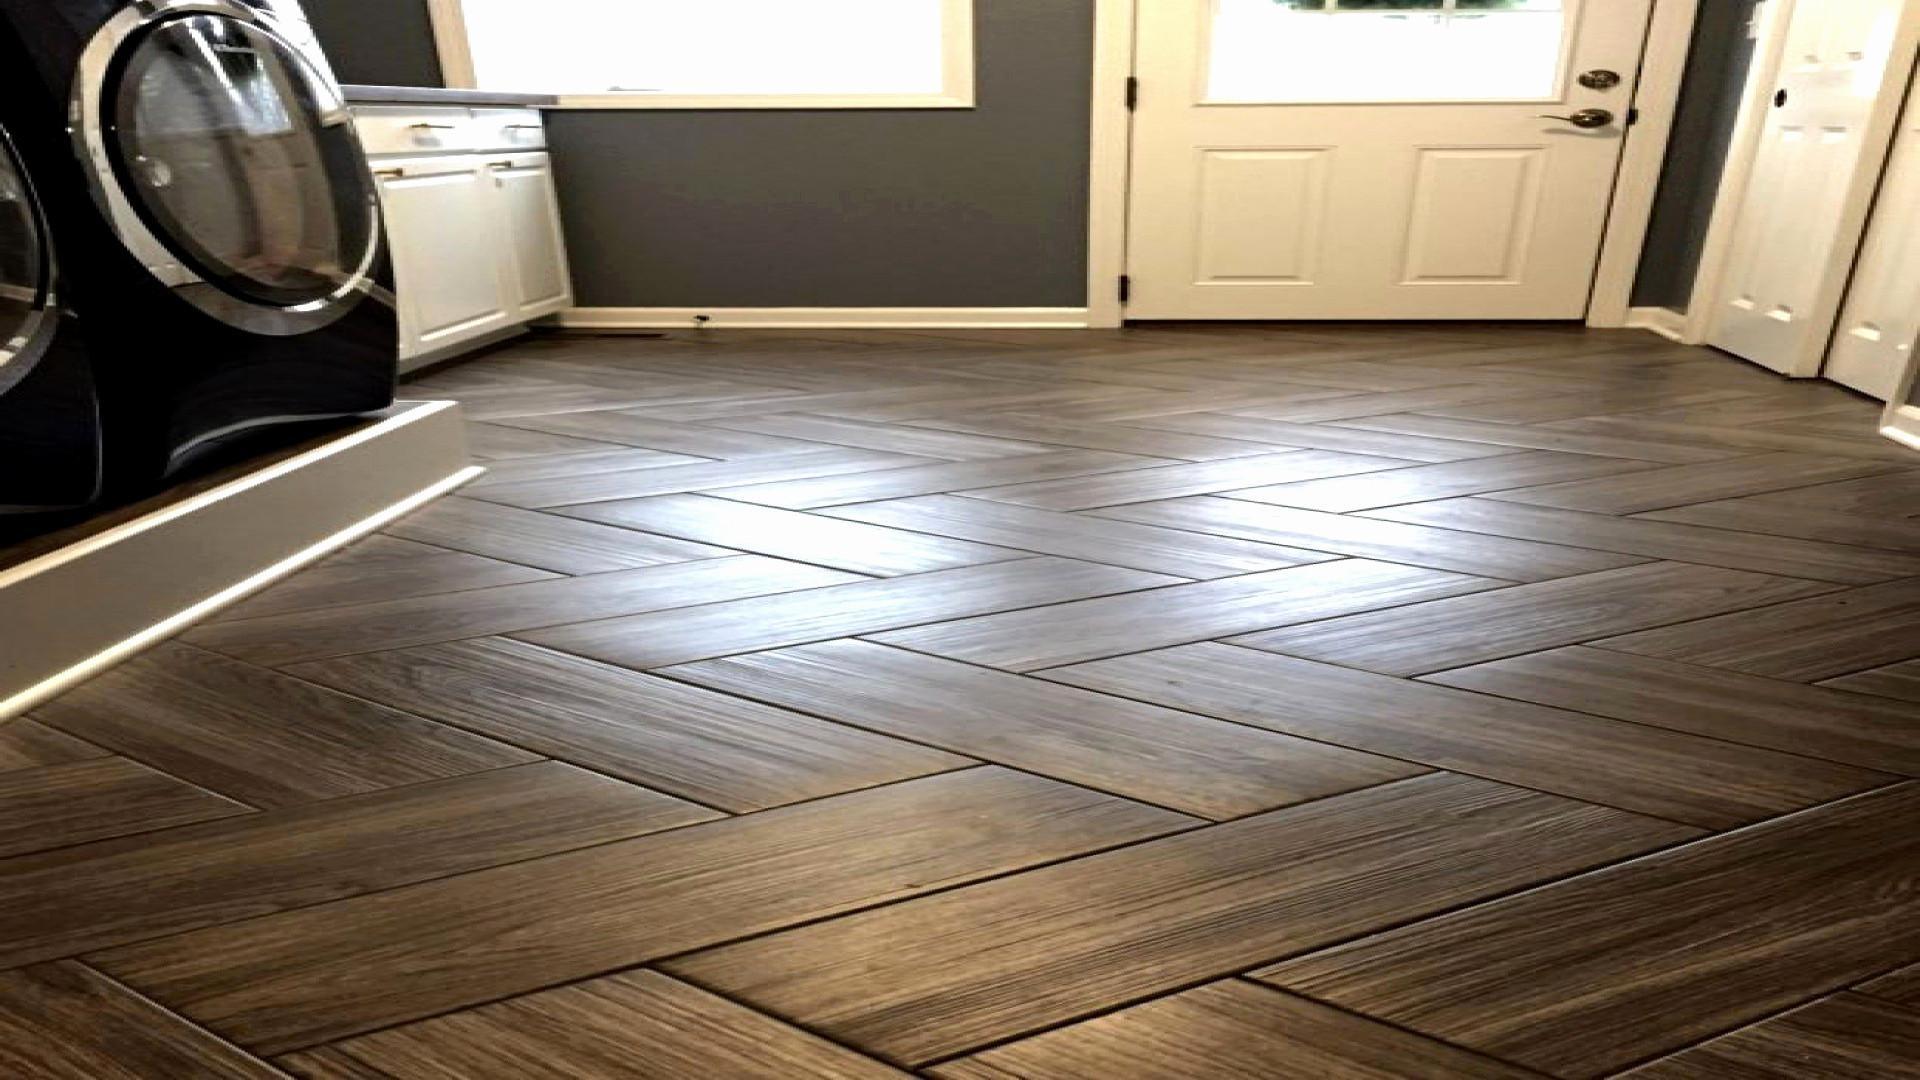 replacing carpet with hardwood floors cost of unique of diy wood flooring images artsvisuelscaribeens com regarding diy wood flooring ideas